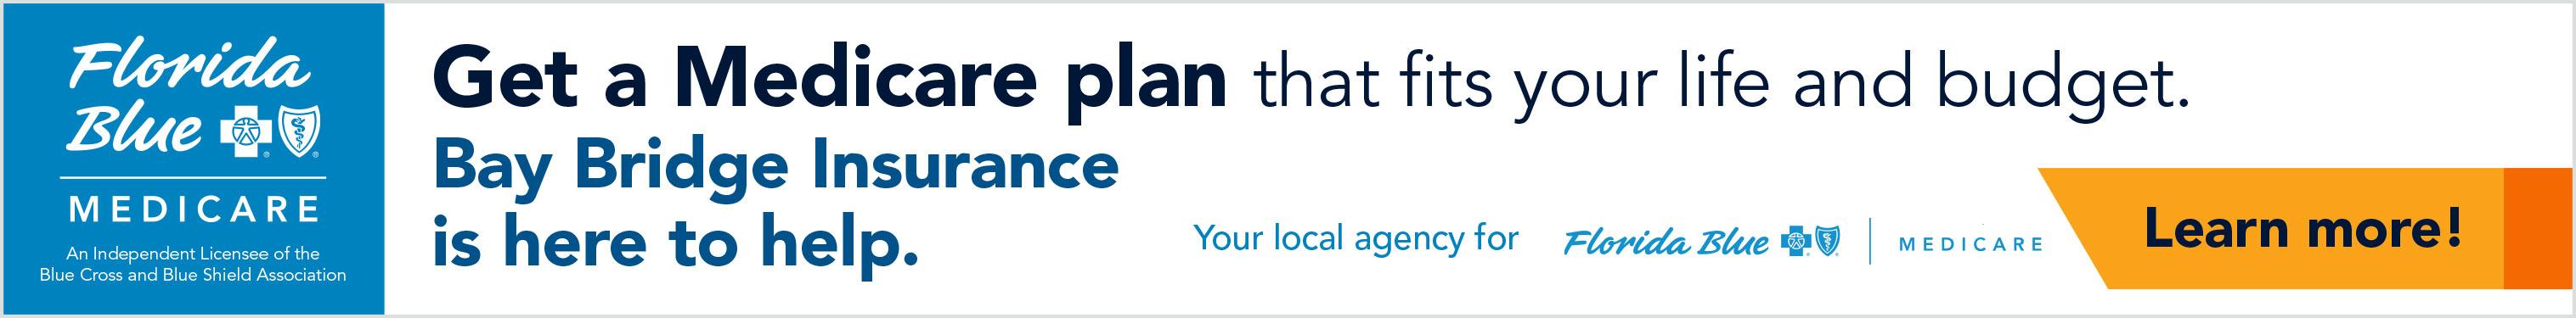 Florida Blue Insurance